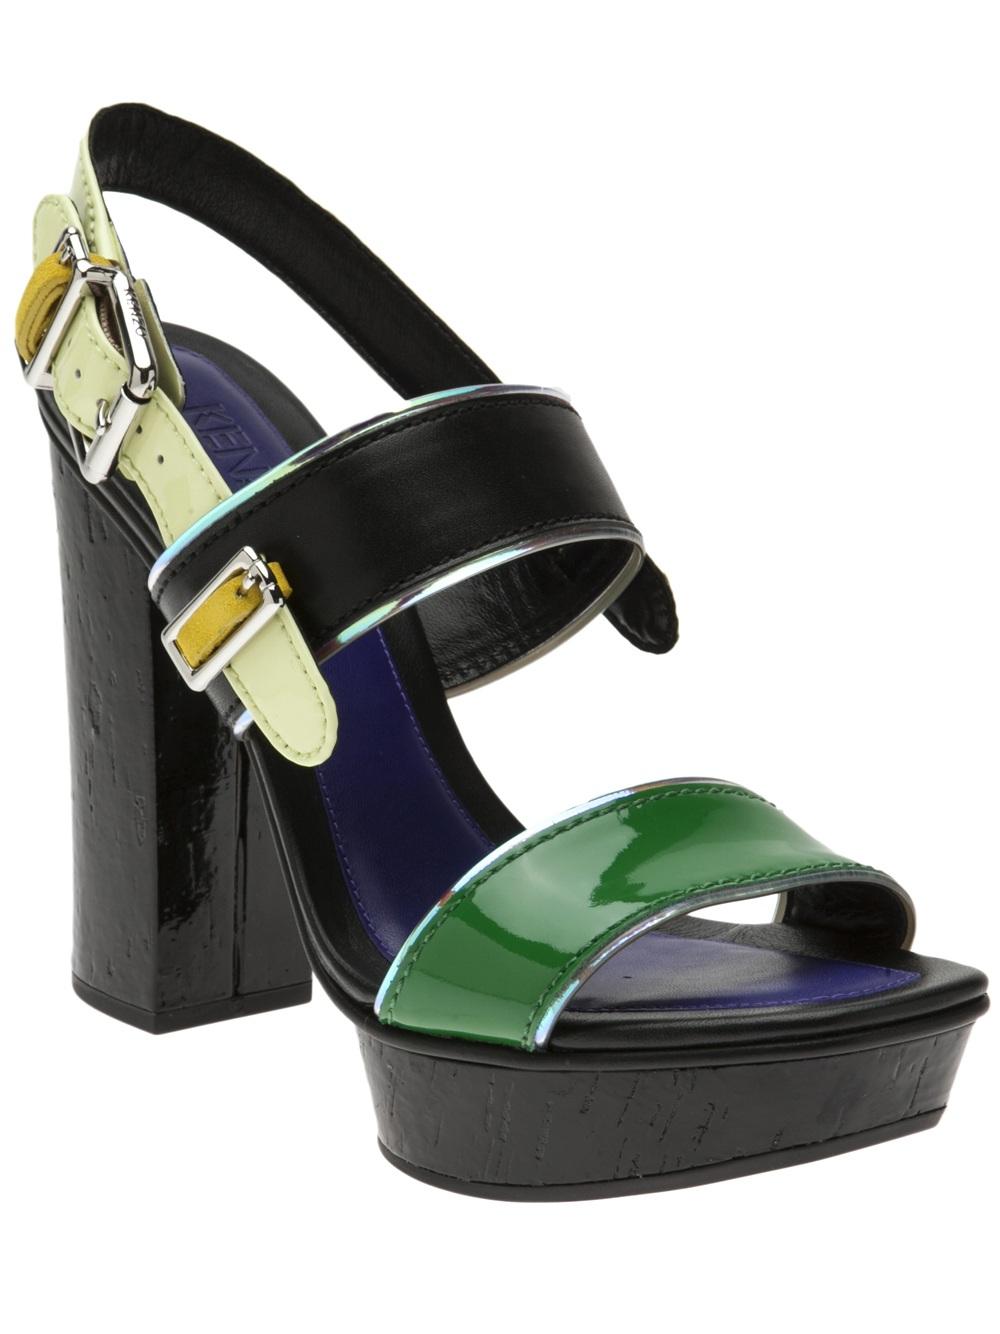 5b0052a4 KENZO Chunky Heel Sandal in Green - Lyst